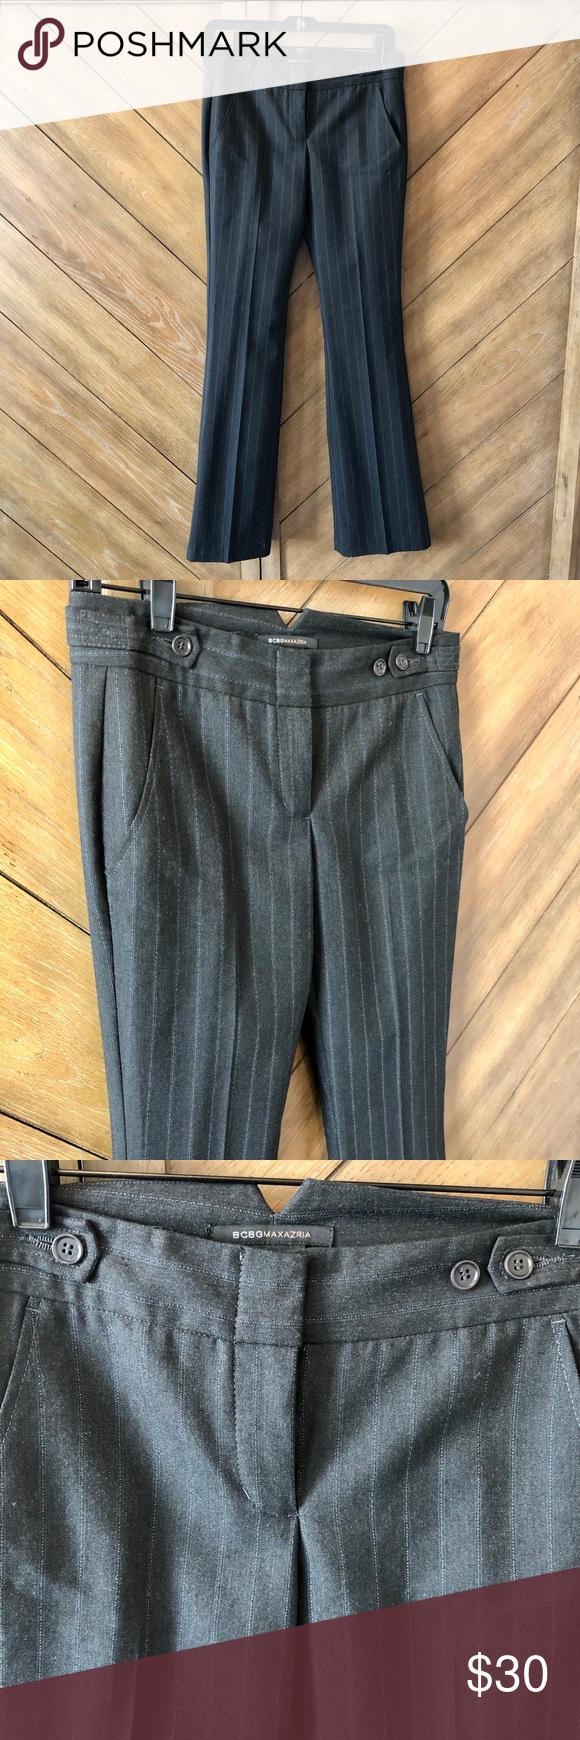 34+ Black pinstripe dress pants trends